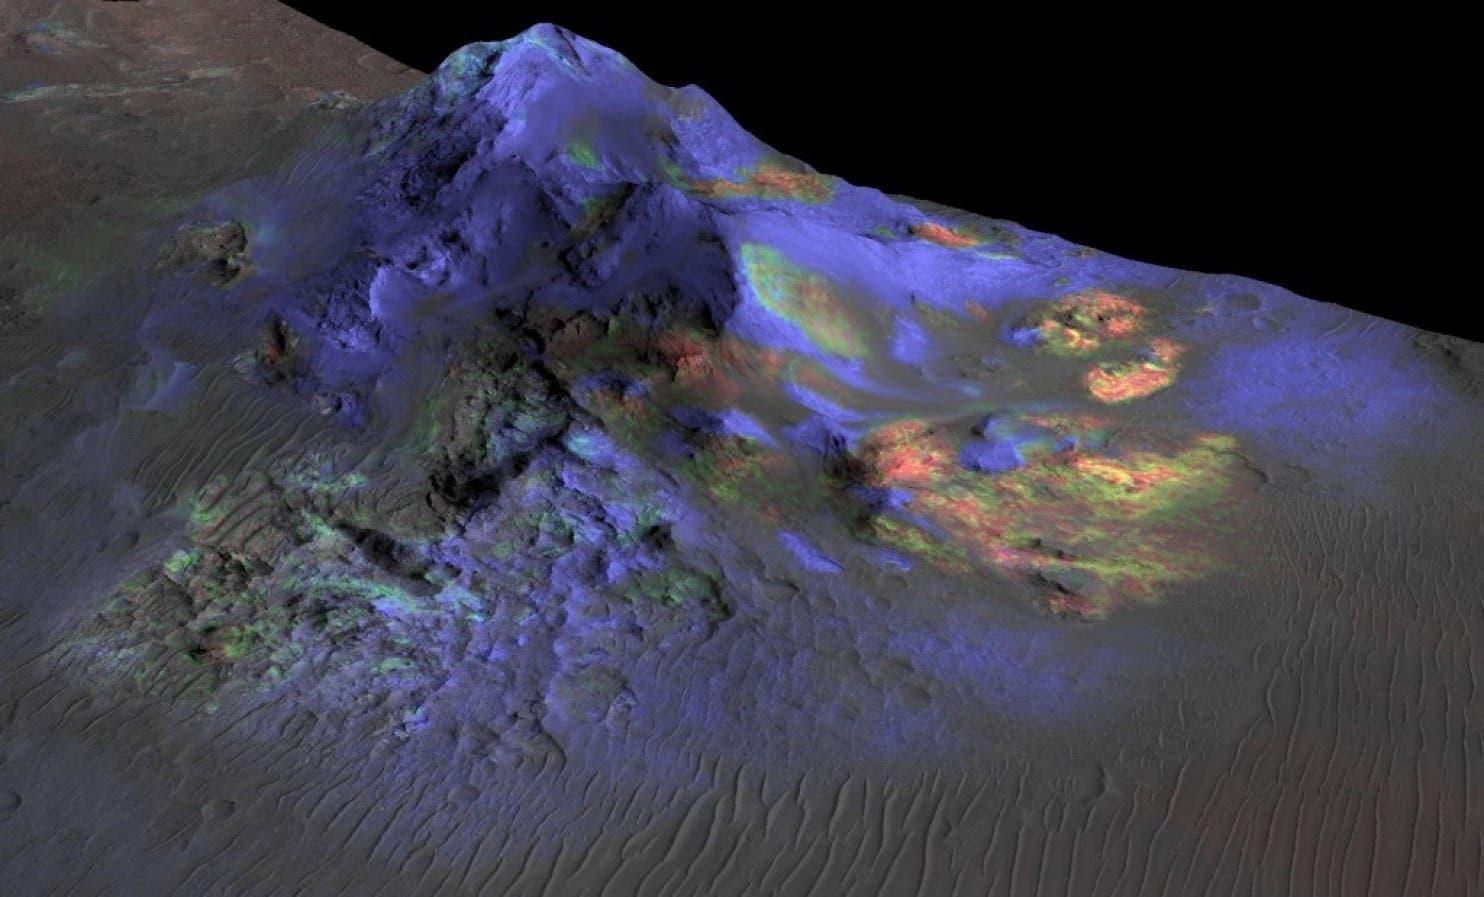 Altglas im Alga-Krater